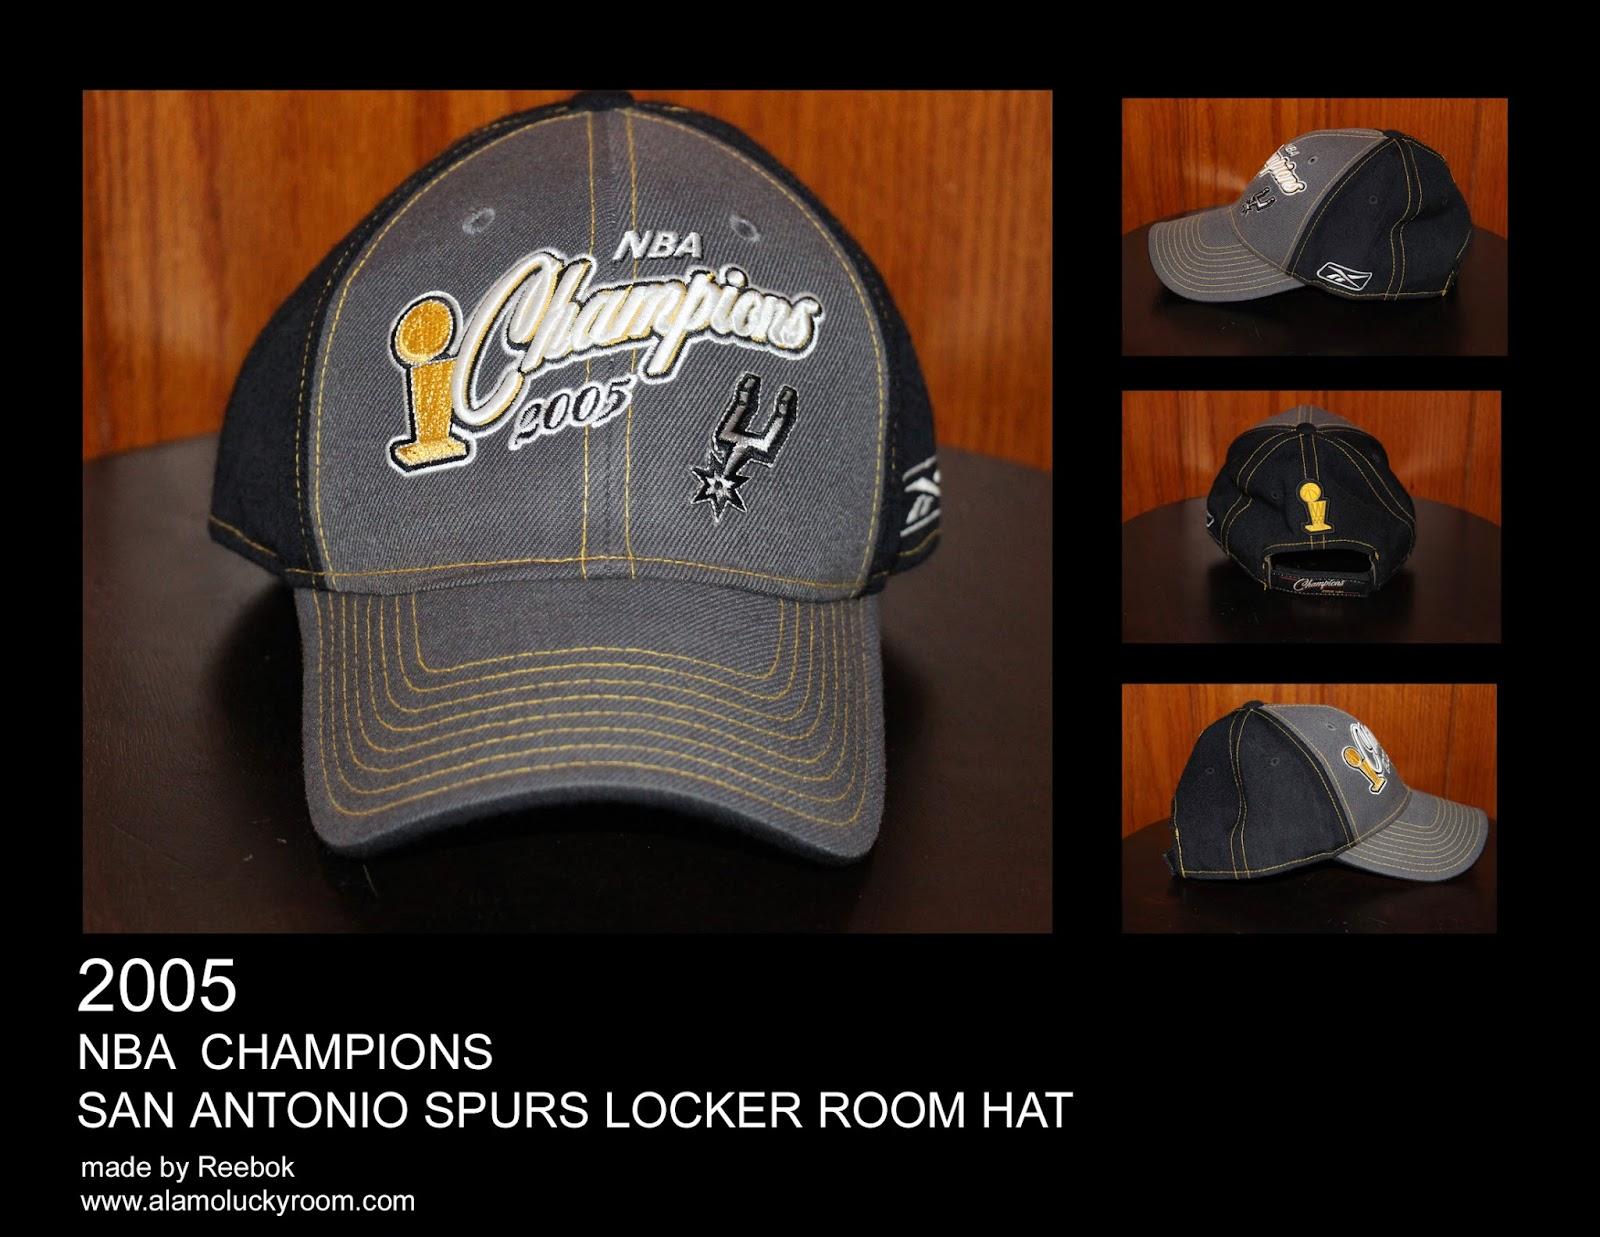 Alamo Lucky Room: 2005 San Antonio Spurs NBA Champions Locker Room Hat